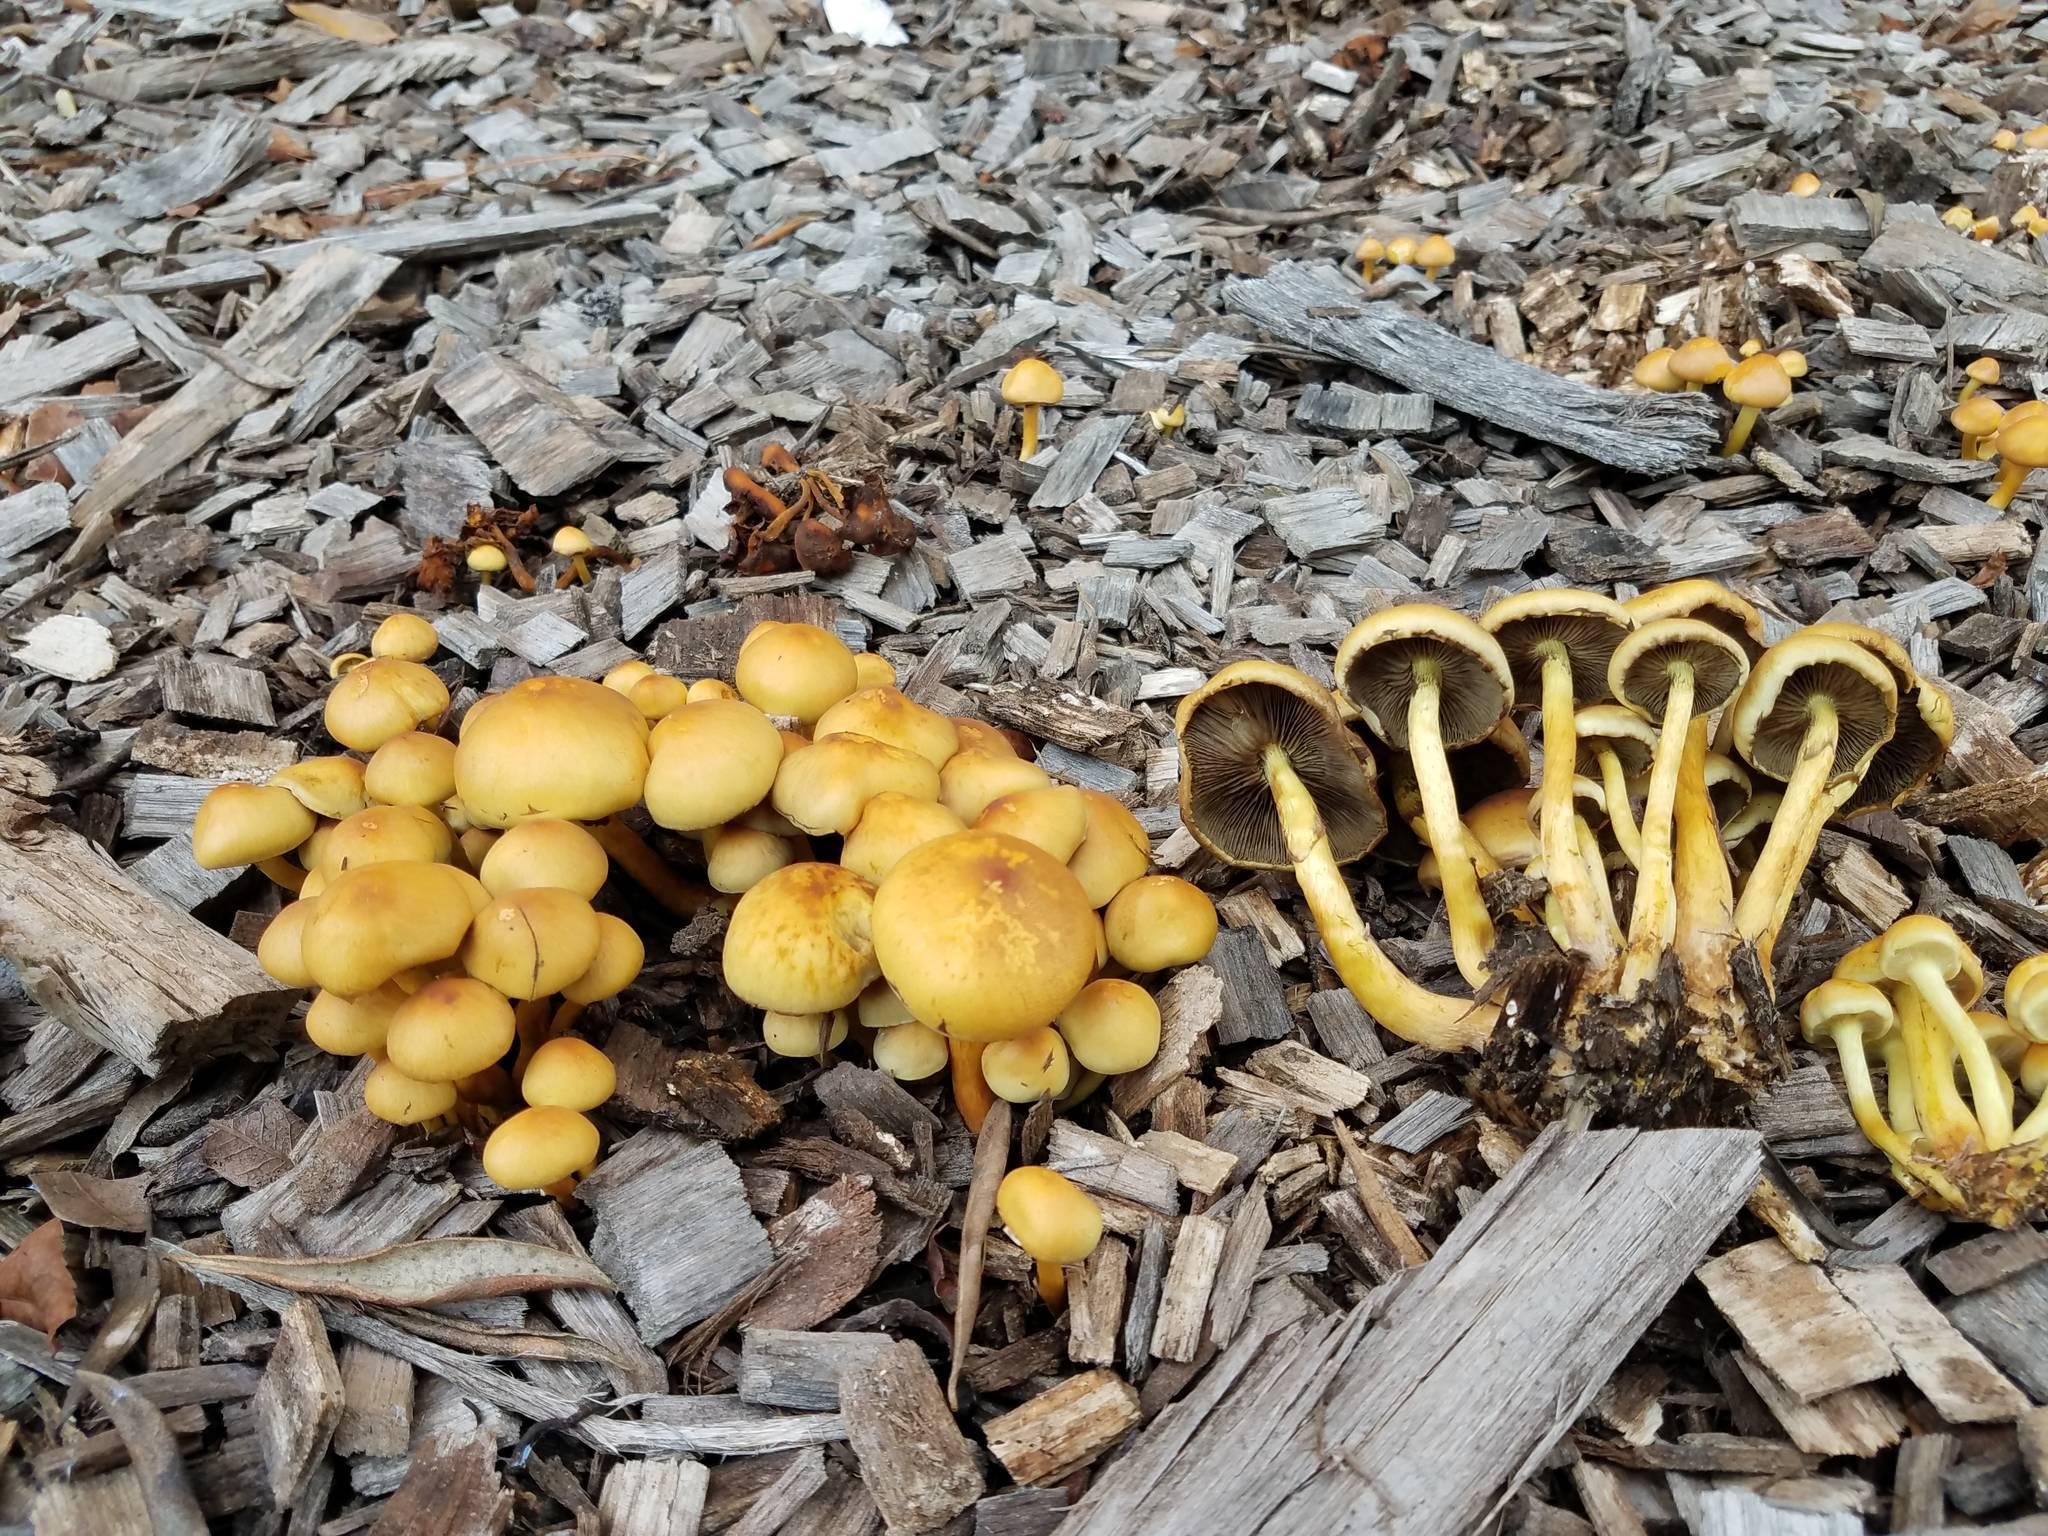 A few Bay Area mushrooms - Mushroom Hunting and Identification